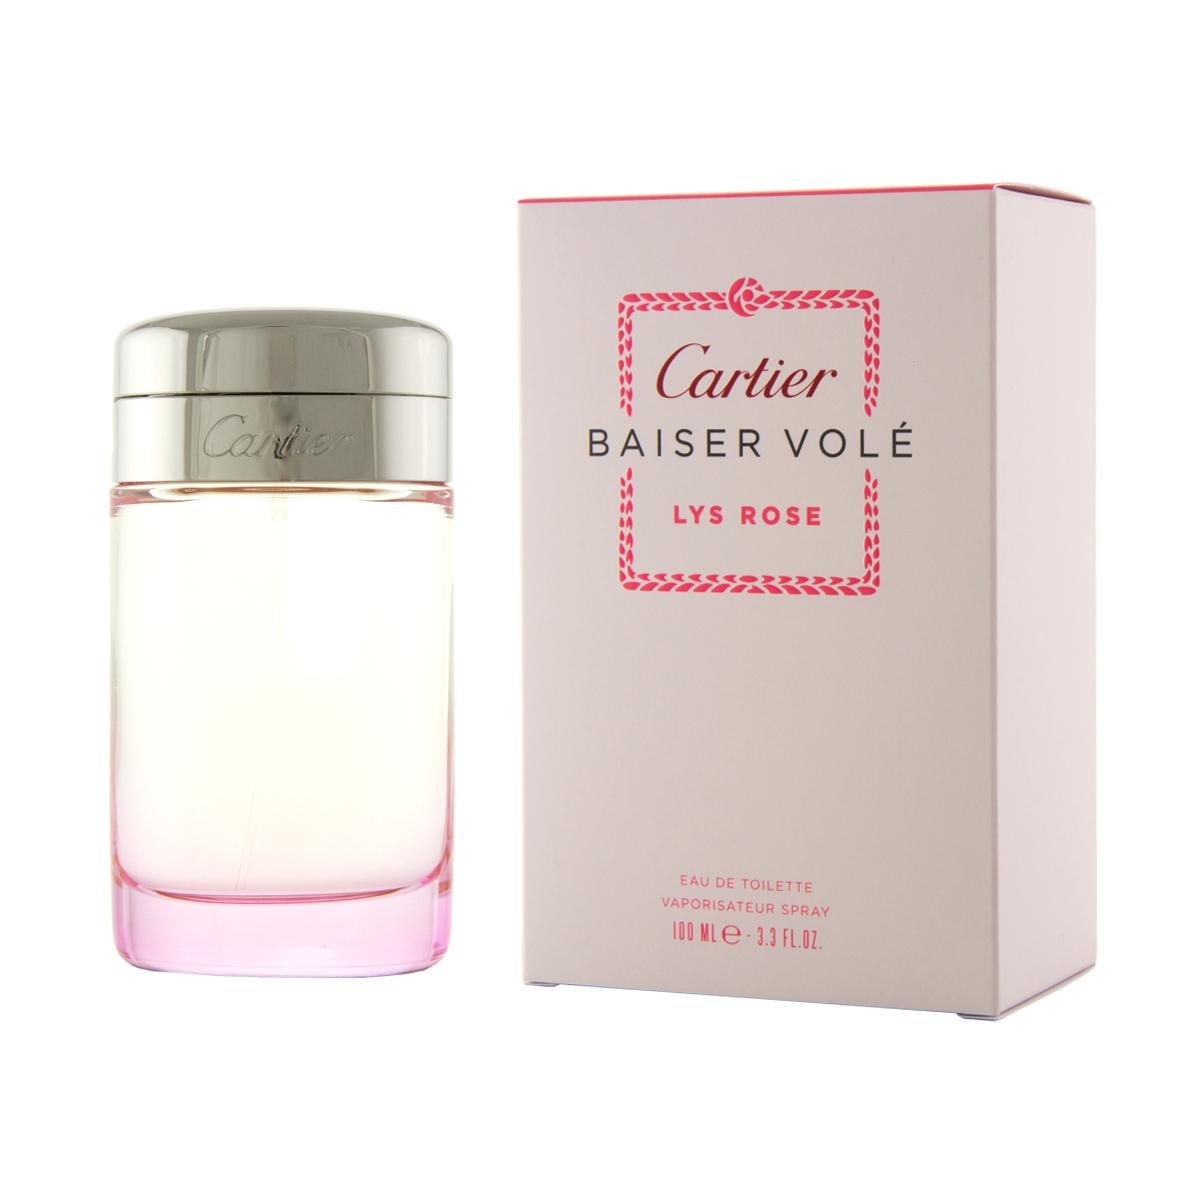 Cartier Baiser Volé Lys Rose EDT 100 ml W